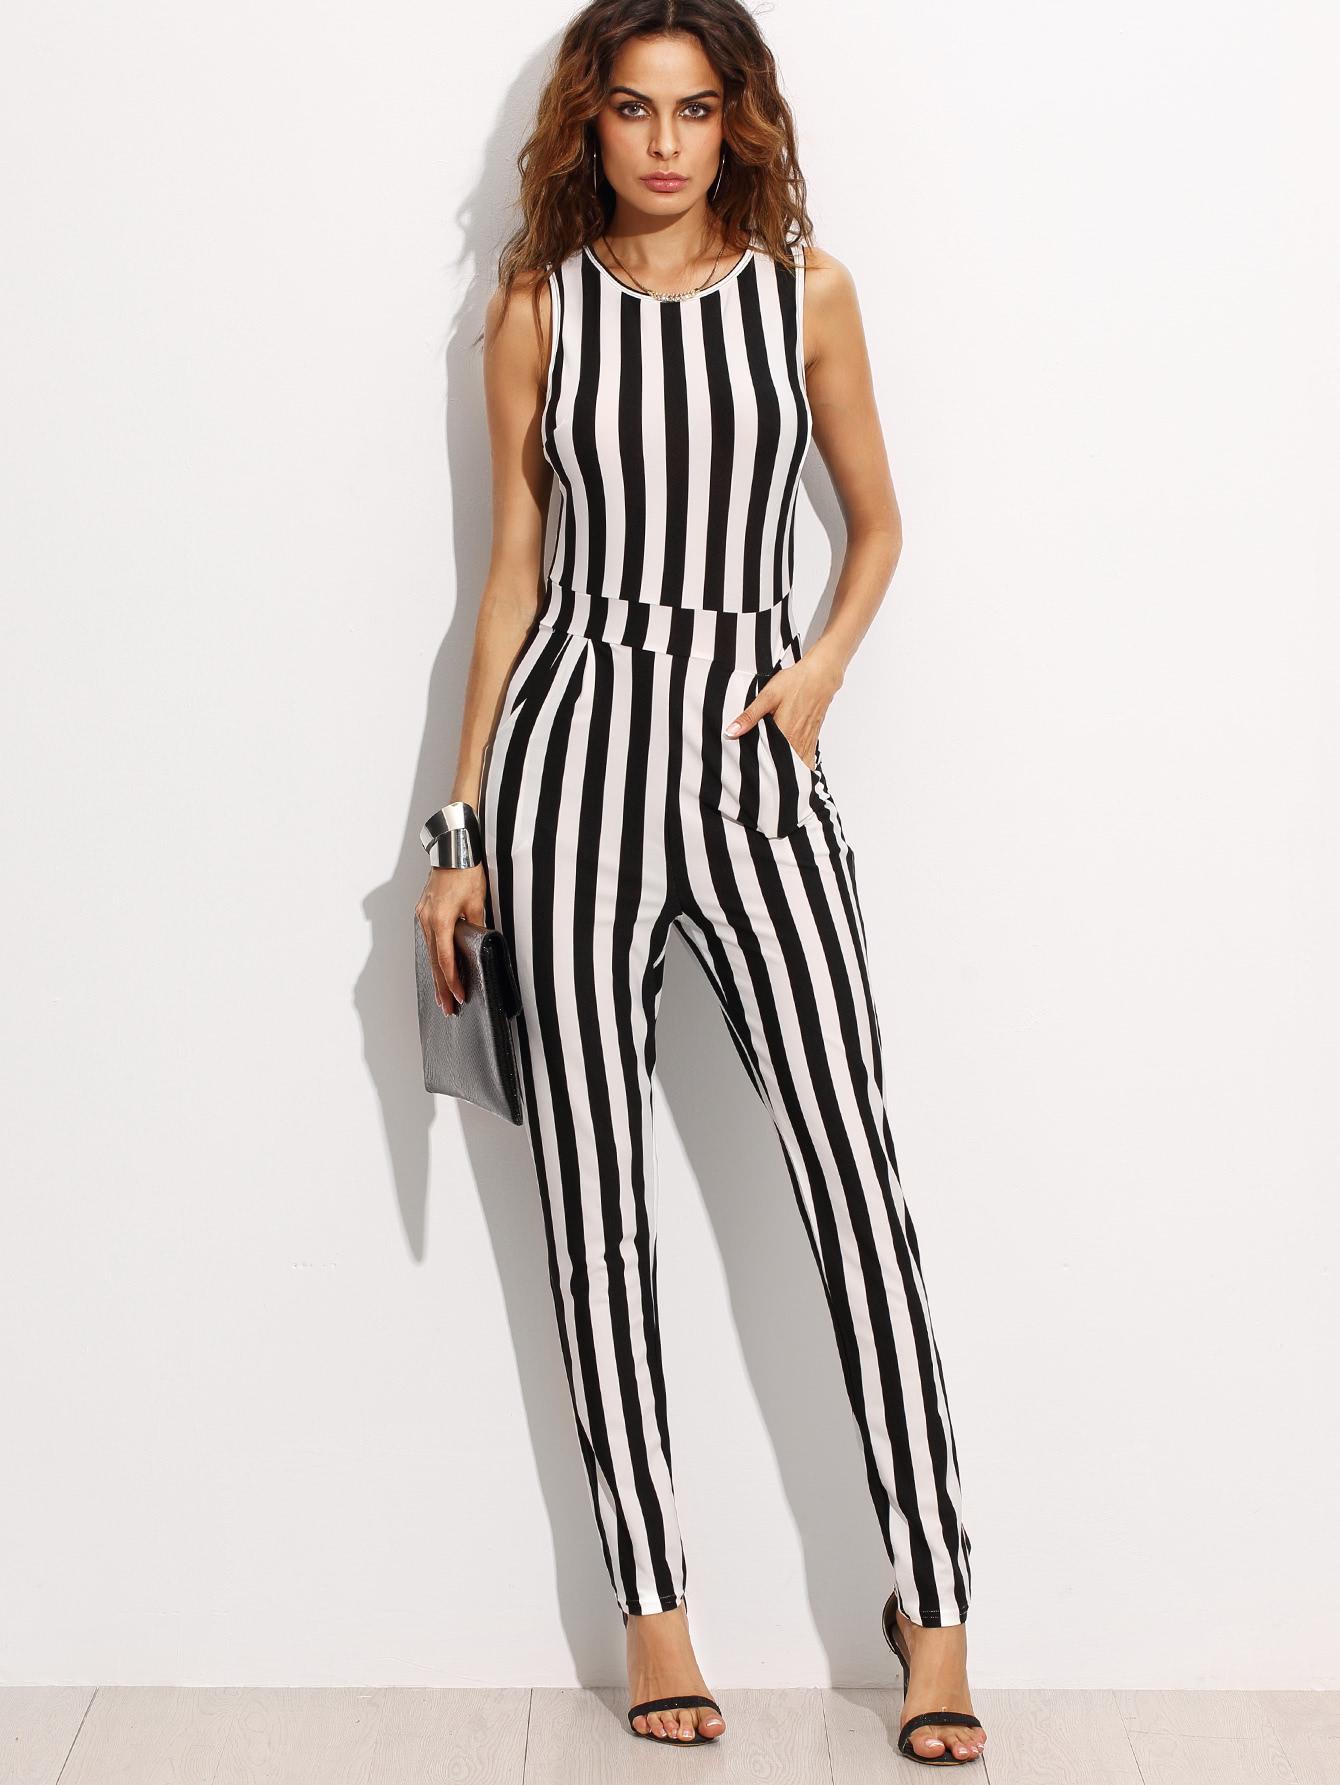 Contrast Vertical Stripe Sleeveless Keyhole Back Jumpsuit contrast vertical stripe sleeveless keyhole back jumpsuit